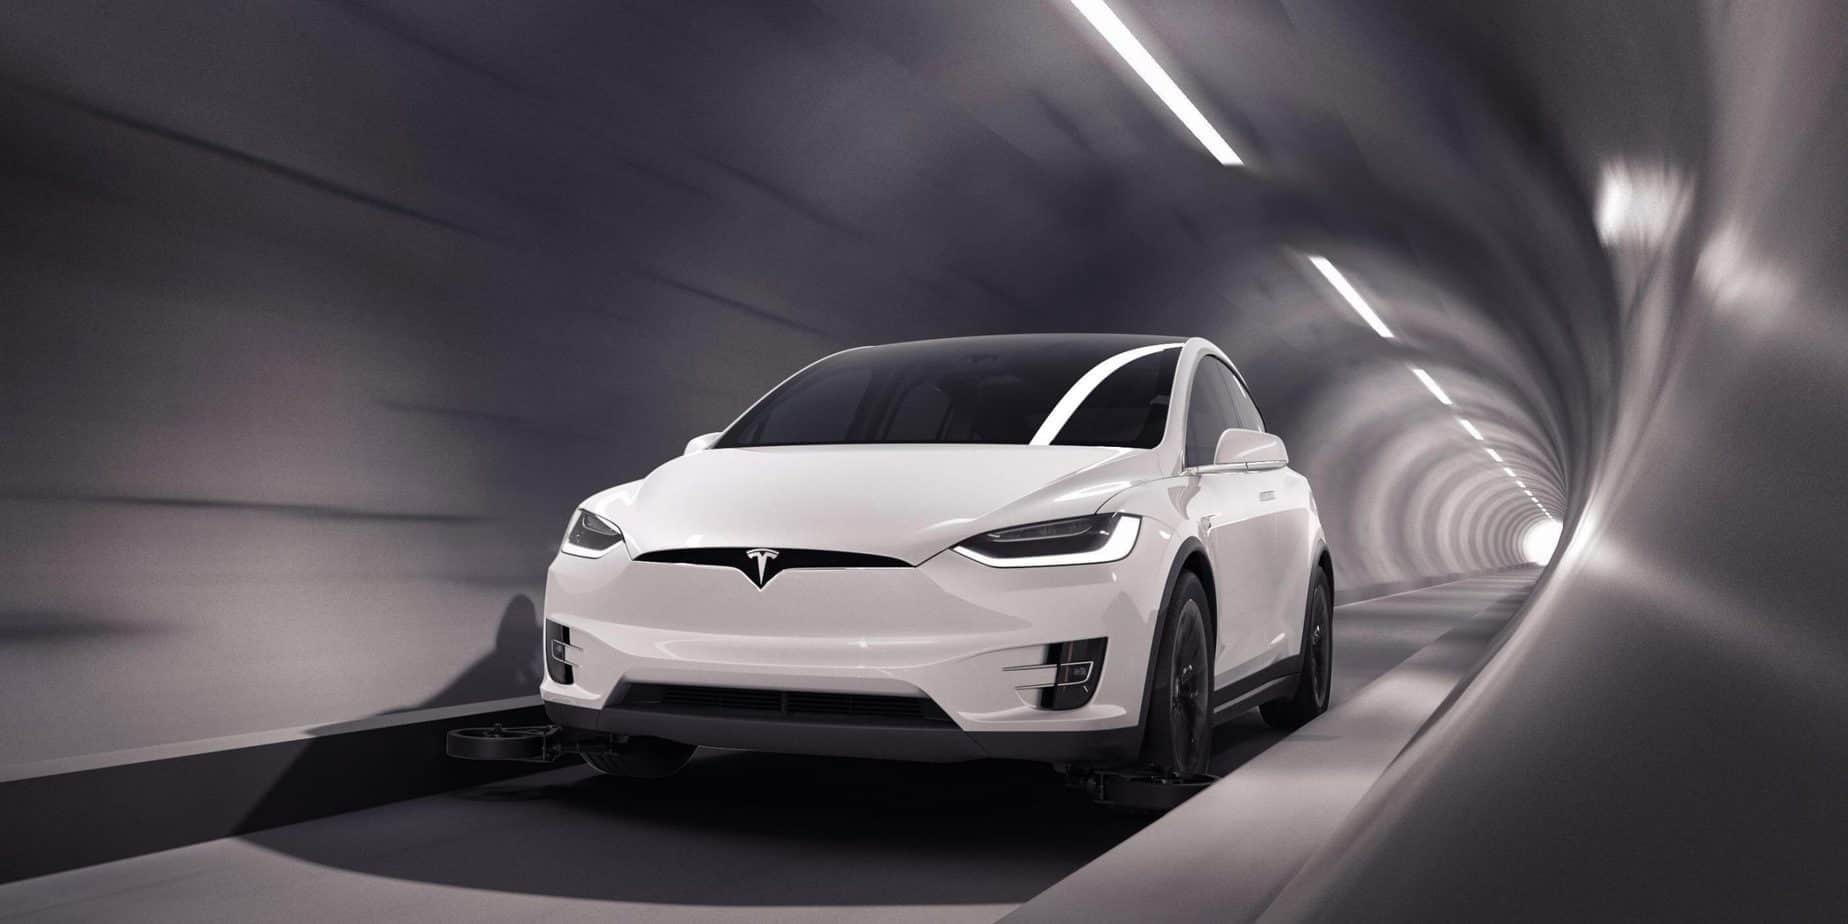 Elon Musk will tunnel under Miami for just $30 million (1)